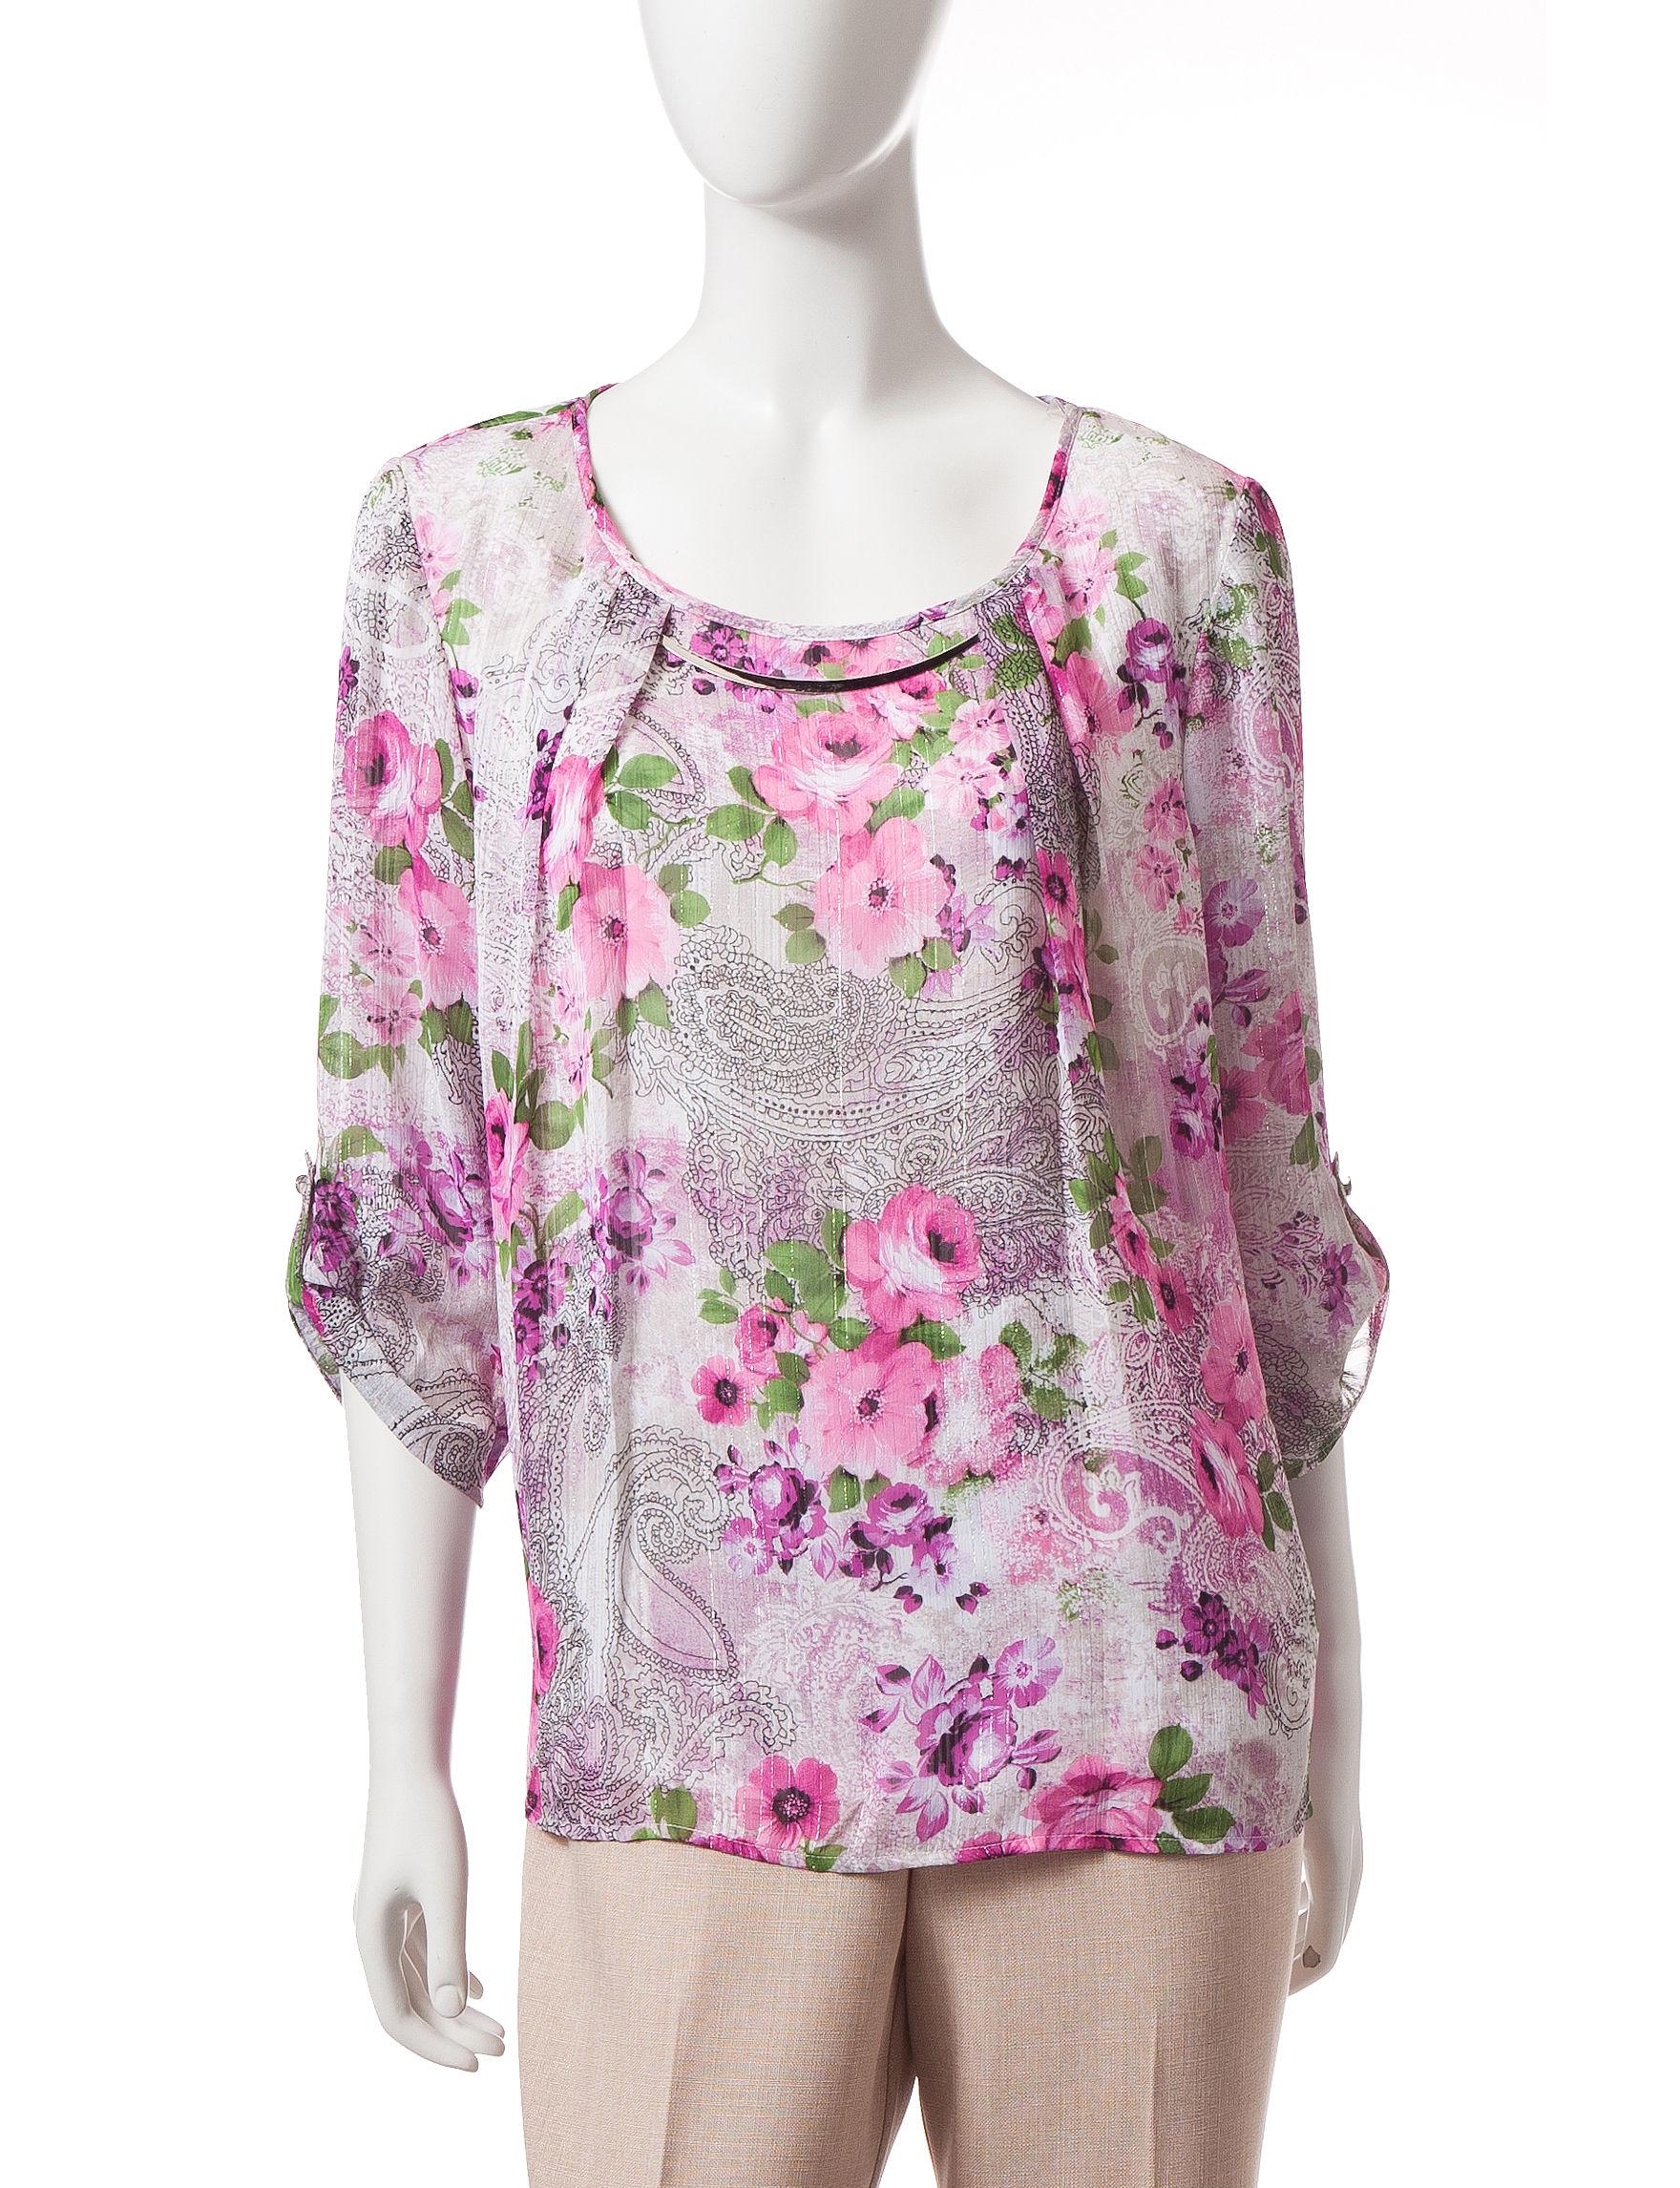 Rebecca Malone Pink / Black Shirts & Blouses